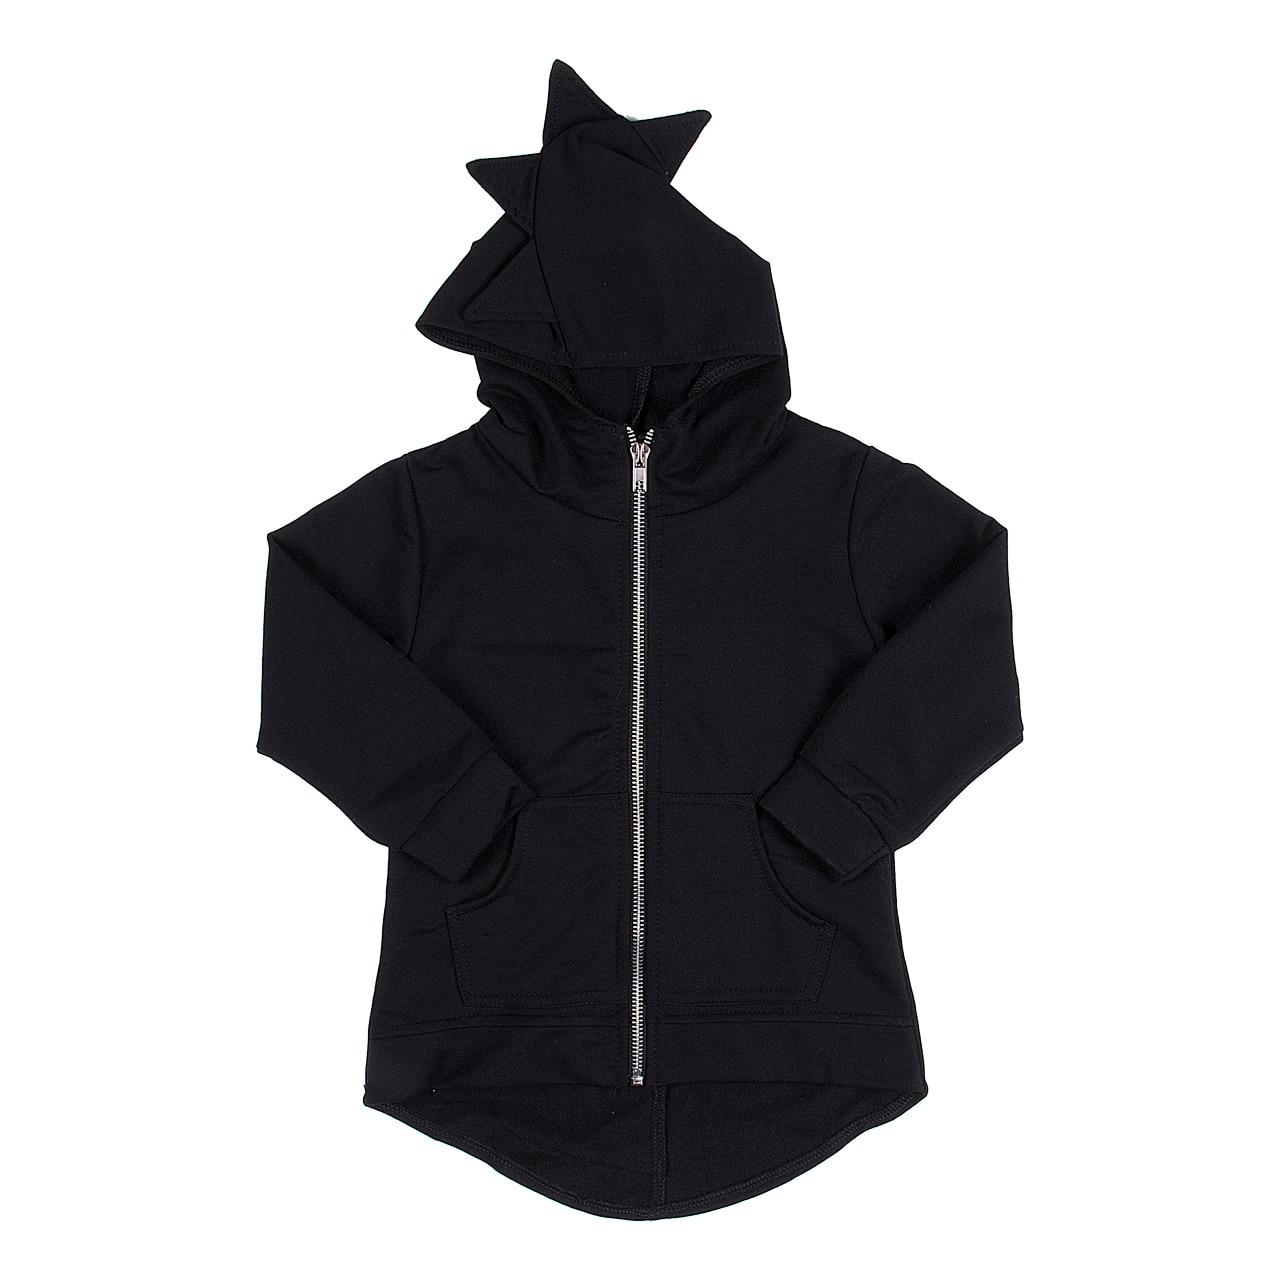 Funny Girls Dinosaur Clothes Kids Boys Coat Hoodies Zipper Long Sleeve Coat Outerwear Warm Clothing